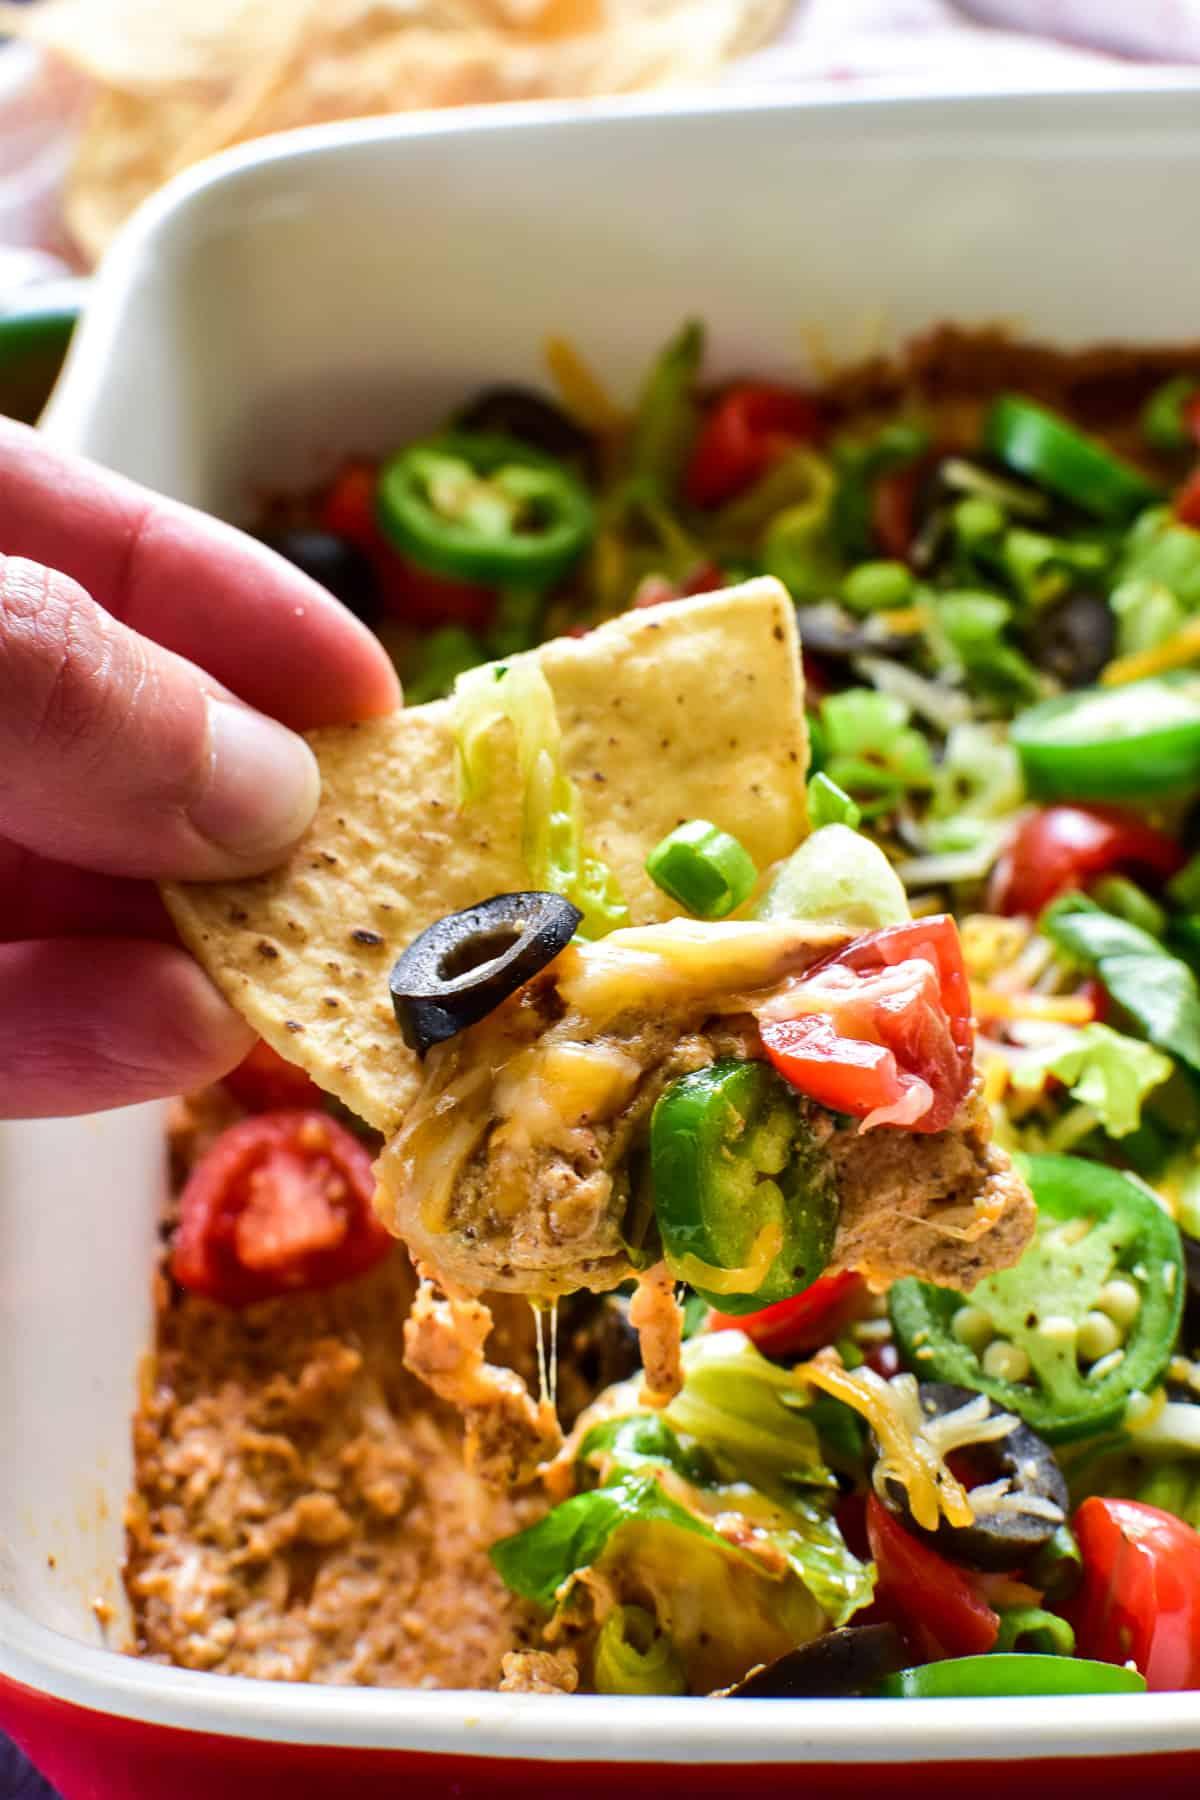 Tortilla chip dipping into Baked Taco Dip